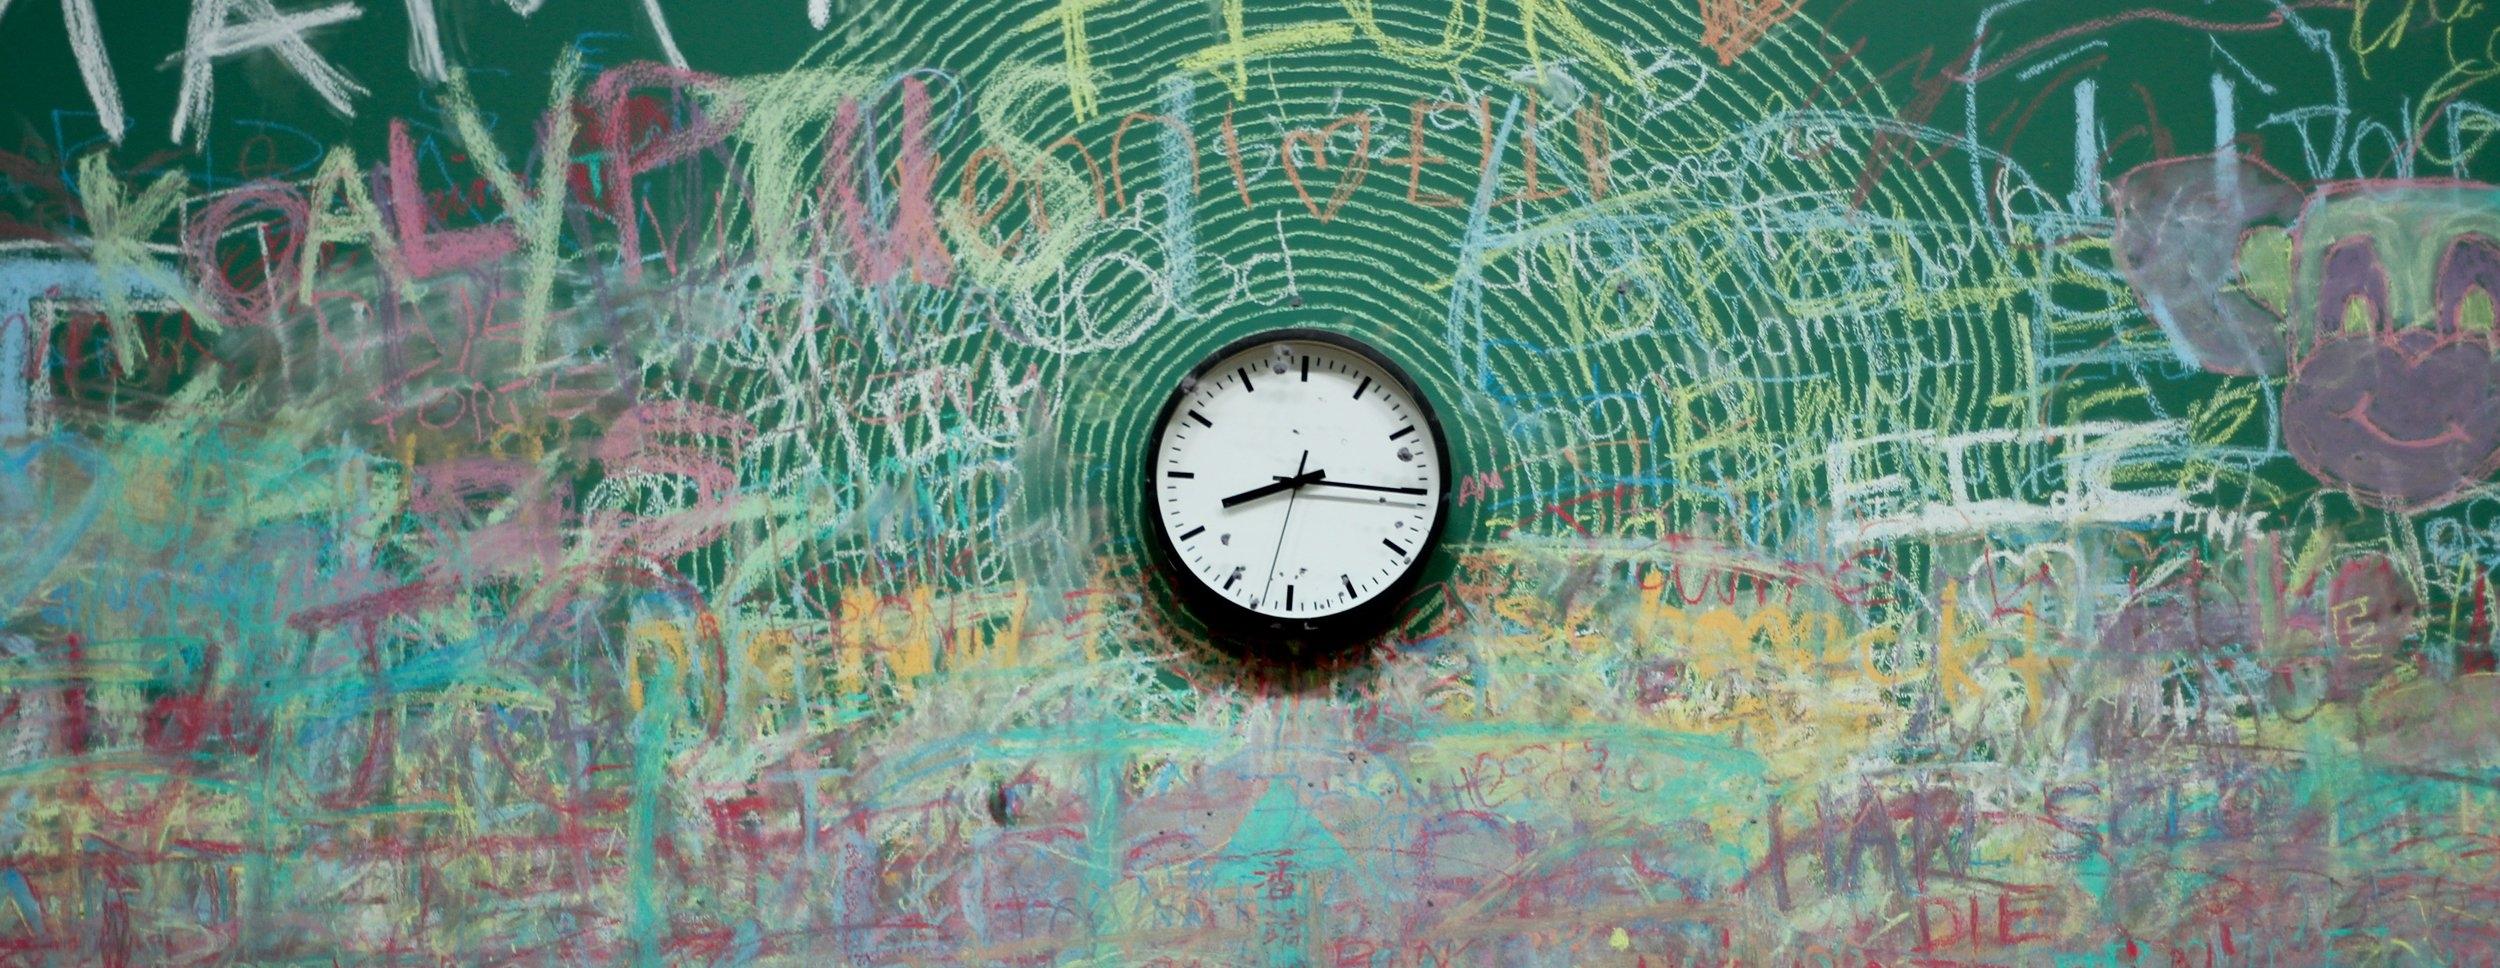 abstract-art-blackboard-121734.jpg